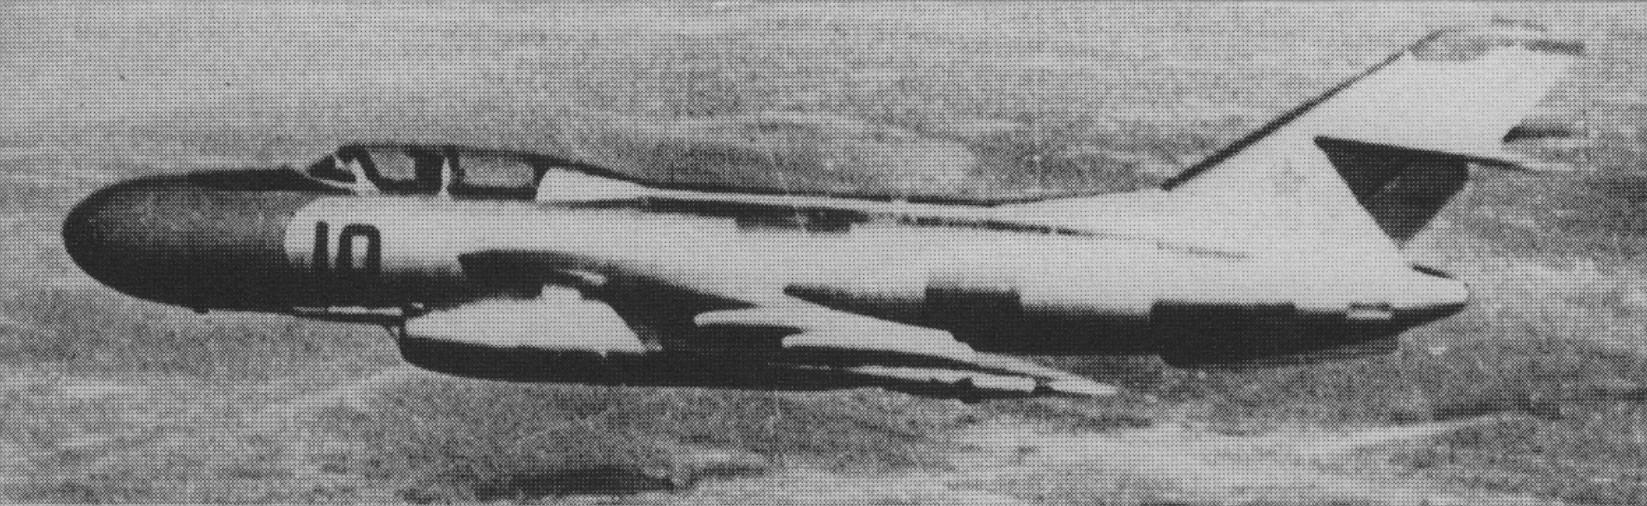 OKB Jakowlew Jak-25 M. Photo of LAC